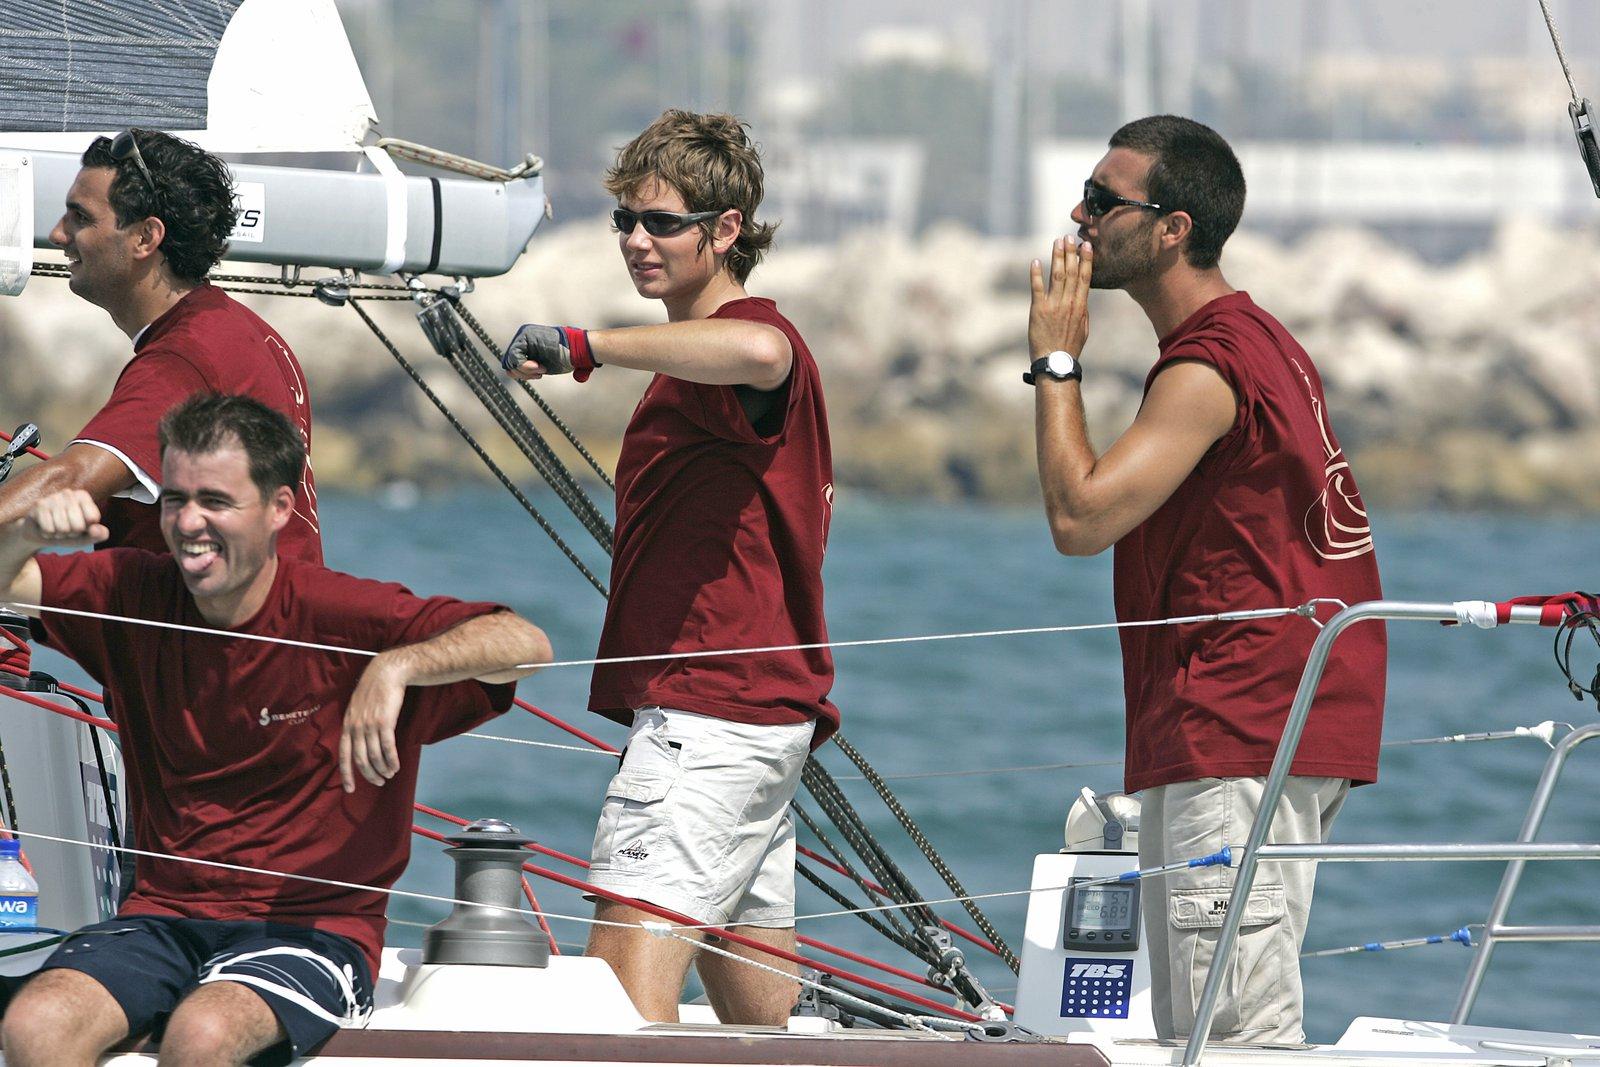 Me sailin